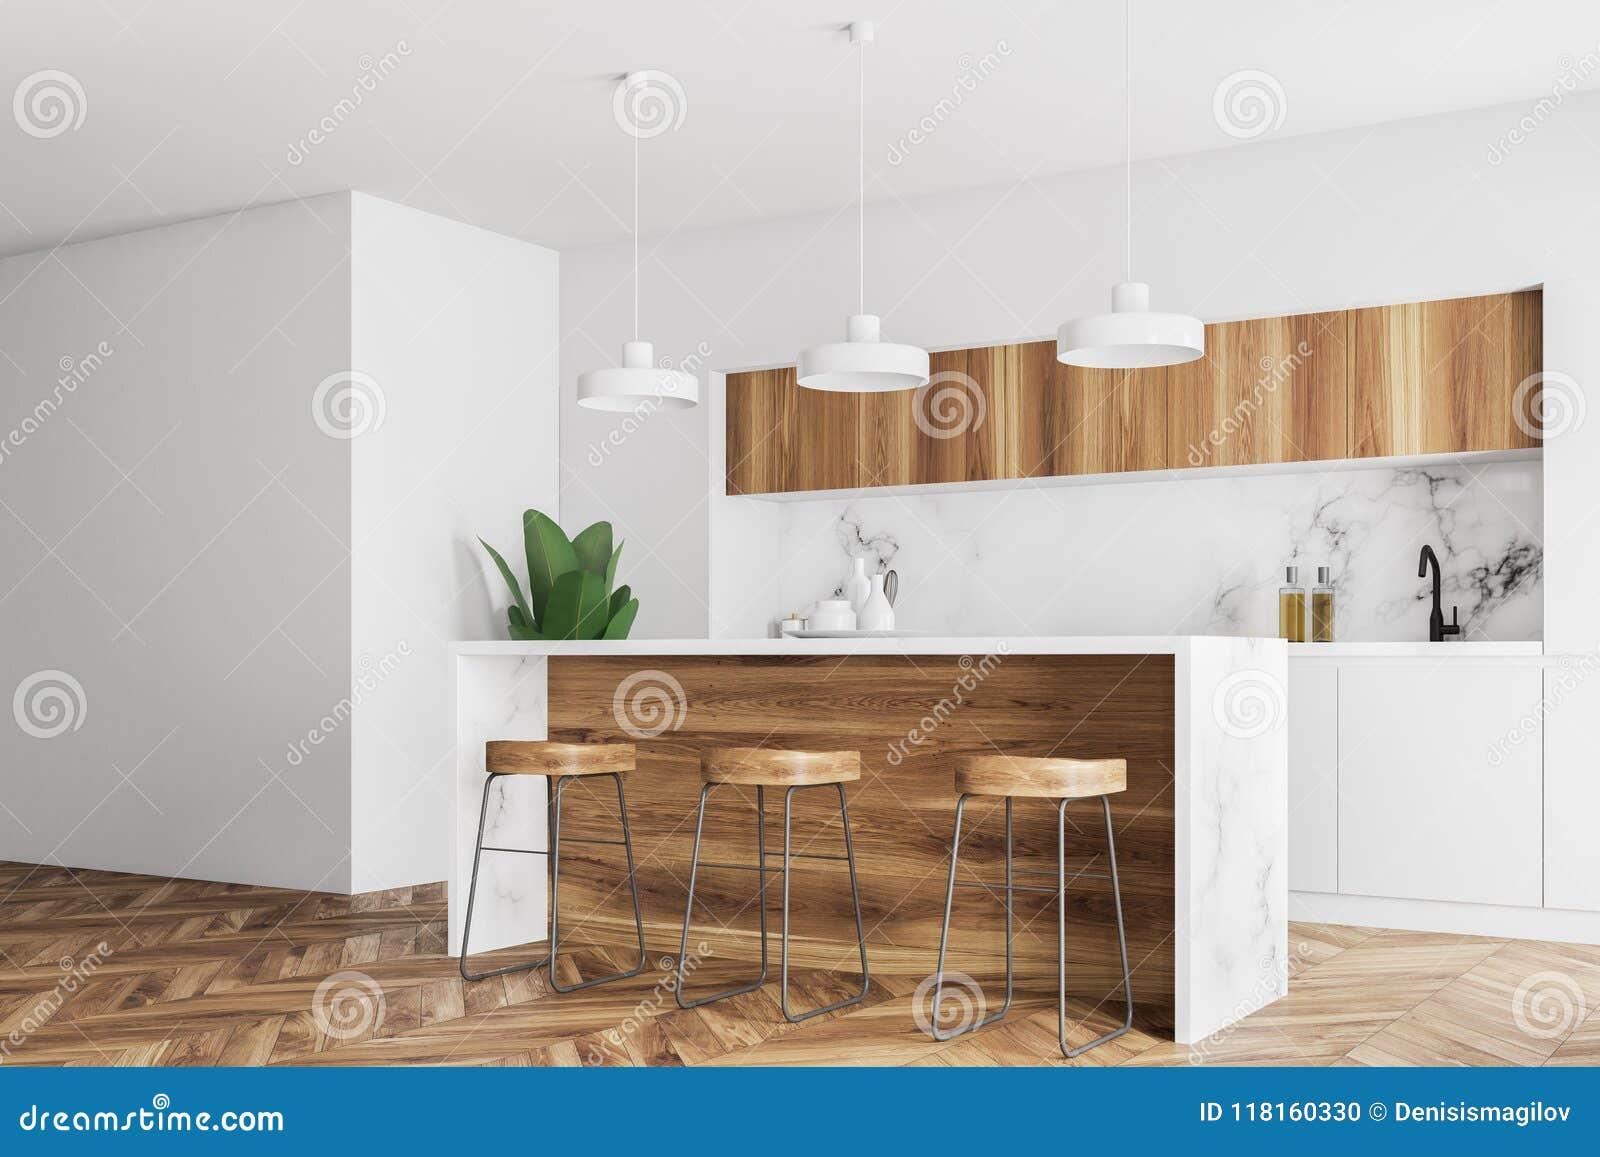 Incredible Wooden Bar In A White Kitchen Interior Side View Stock Inzonedesignstudio Interior Chair Design Inzonedesignstudiocom